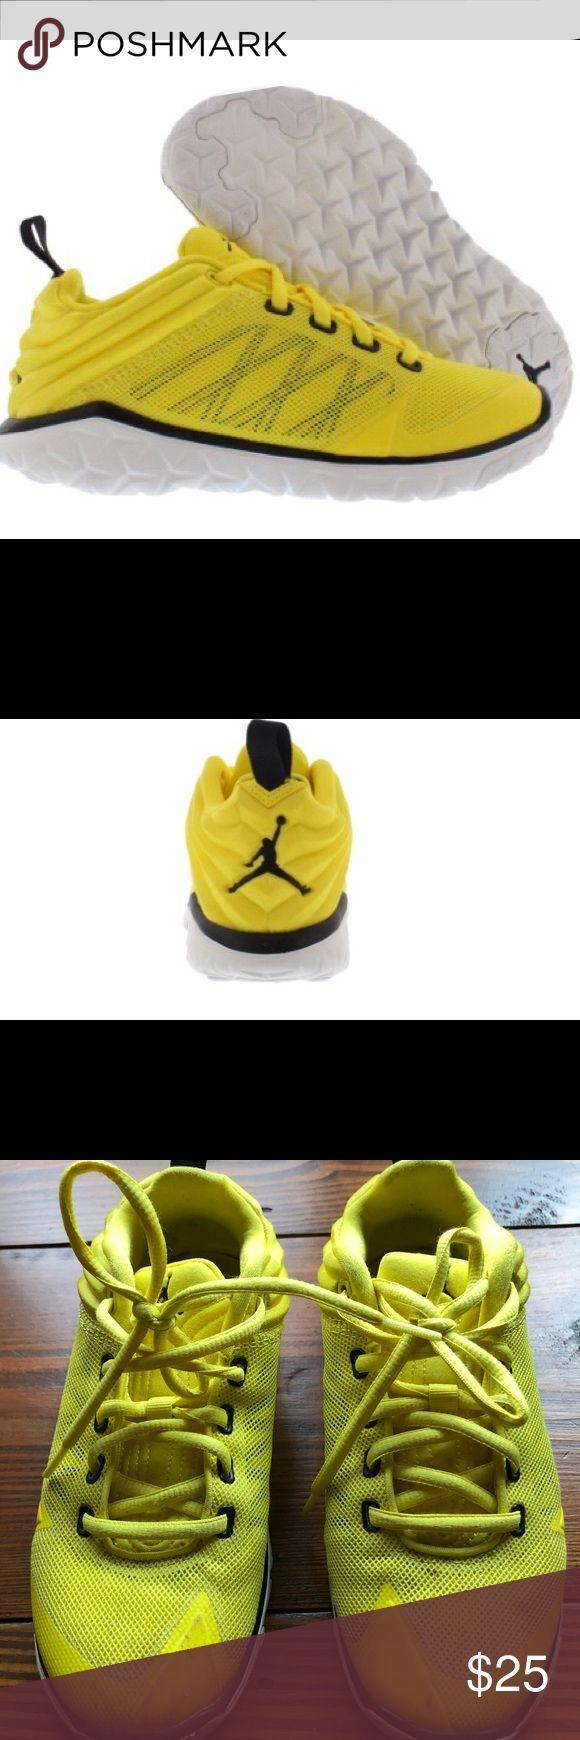 Jordan Flex Trainer Basketball Boy's Shoes Jordan Boys Athletic Sneakers  Vibrant Yellow/ Black/ White   Fits a women's size 5.5/ 6   Boys size 4.5  Shoe width medium Jordan Shoes Sneakers